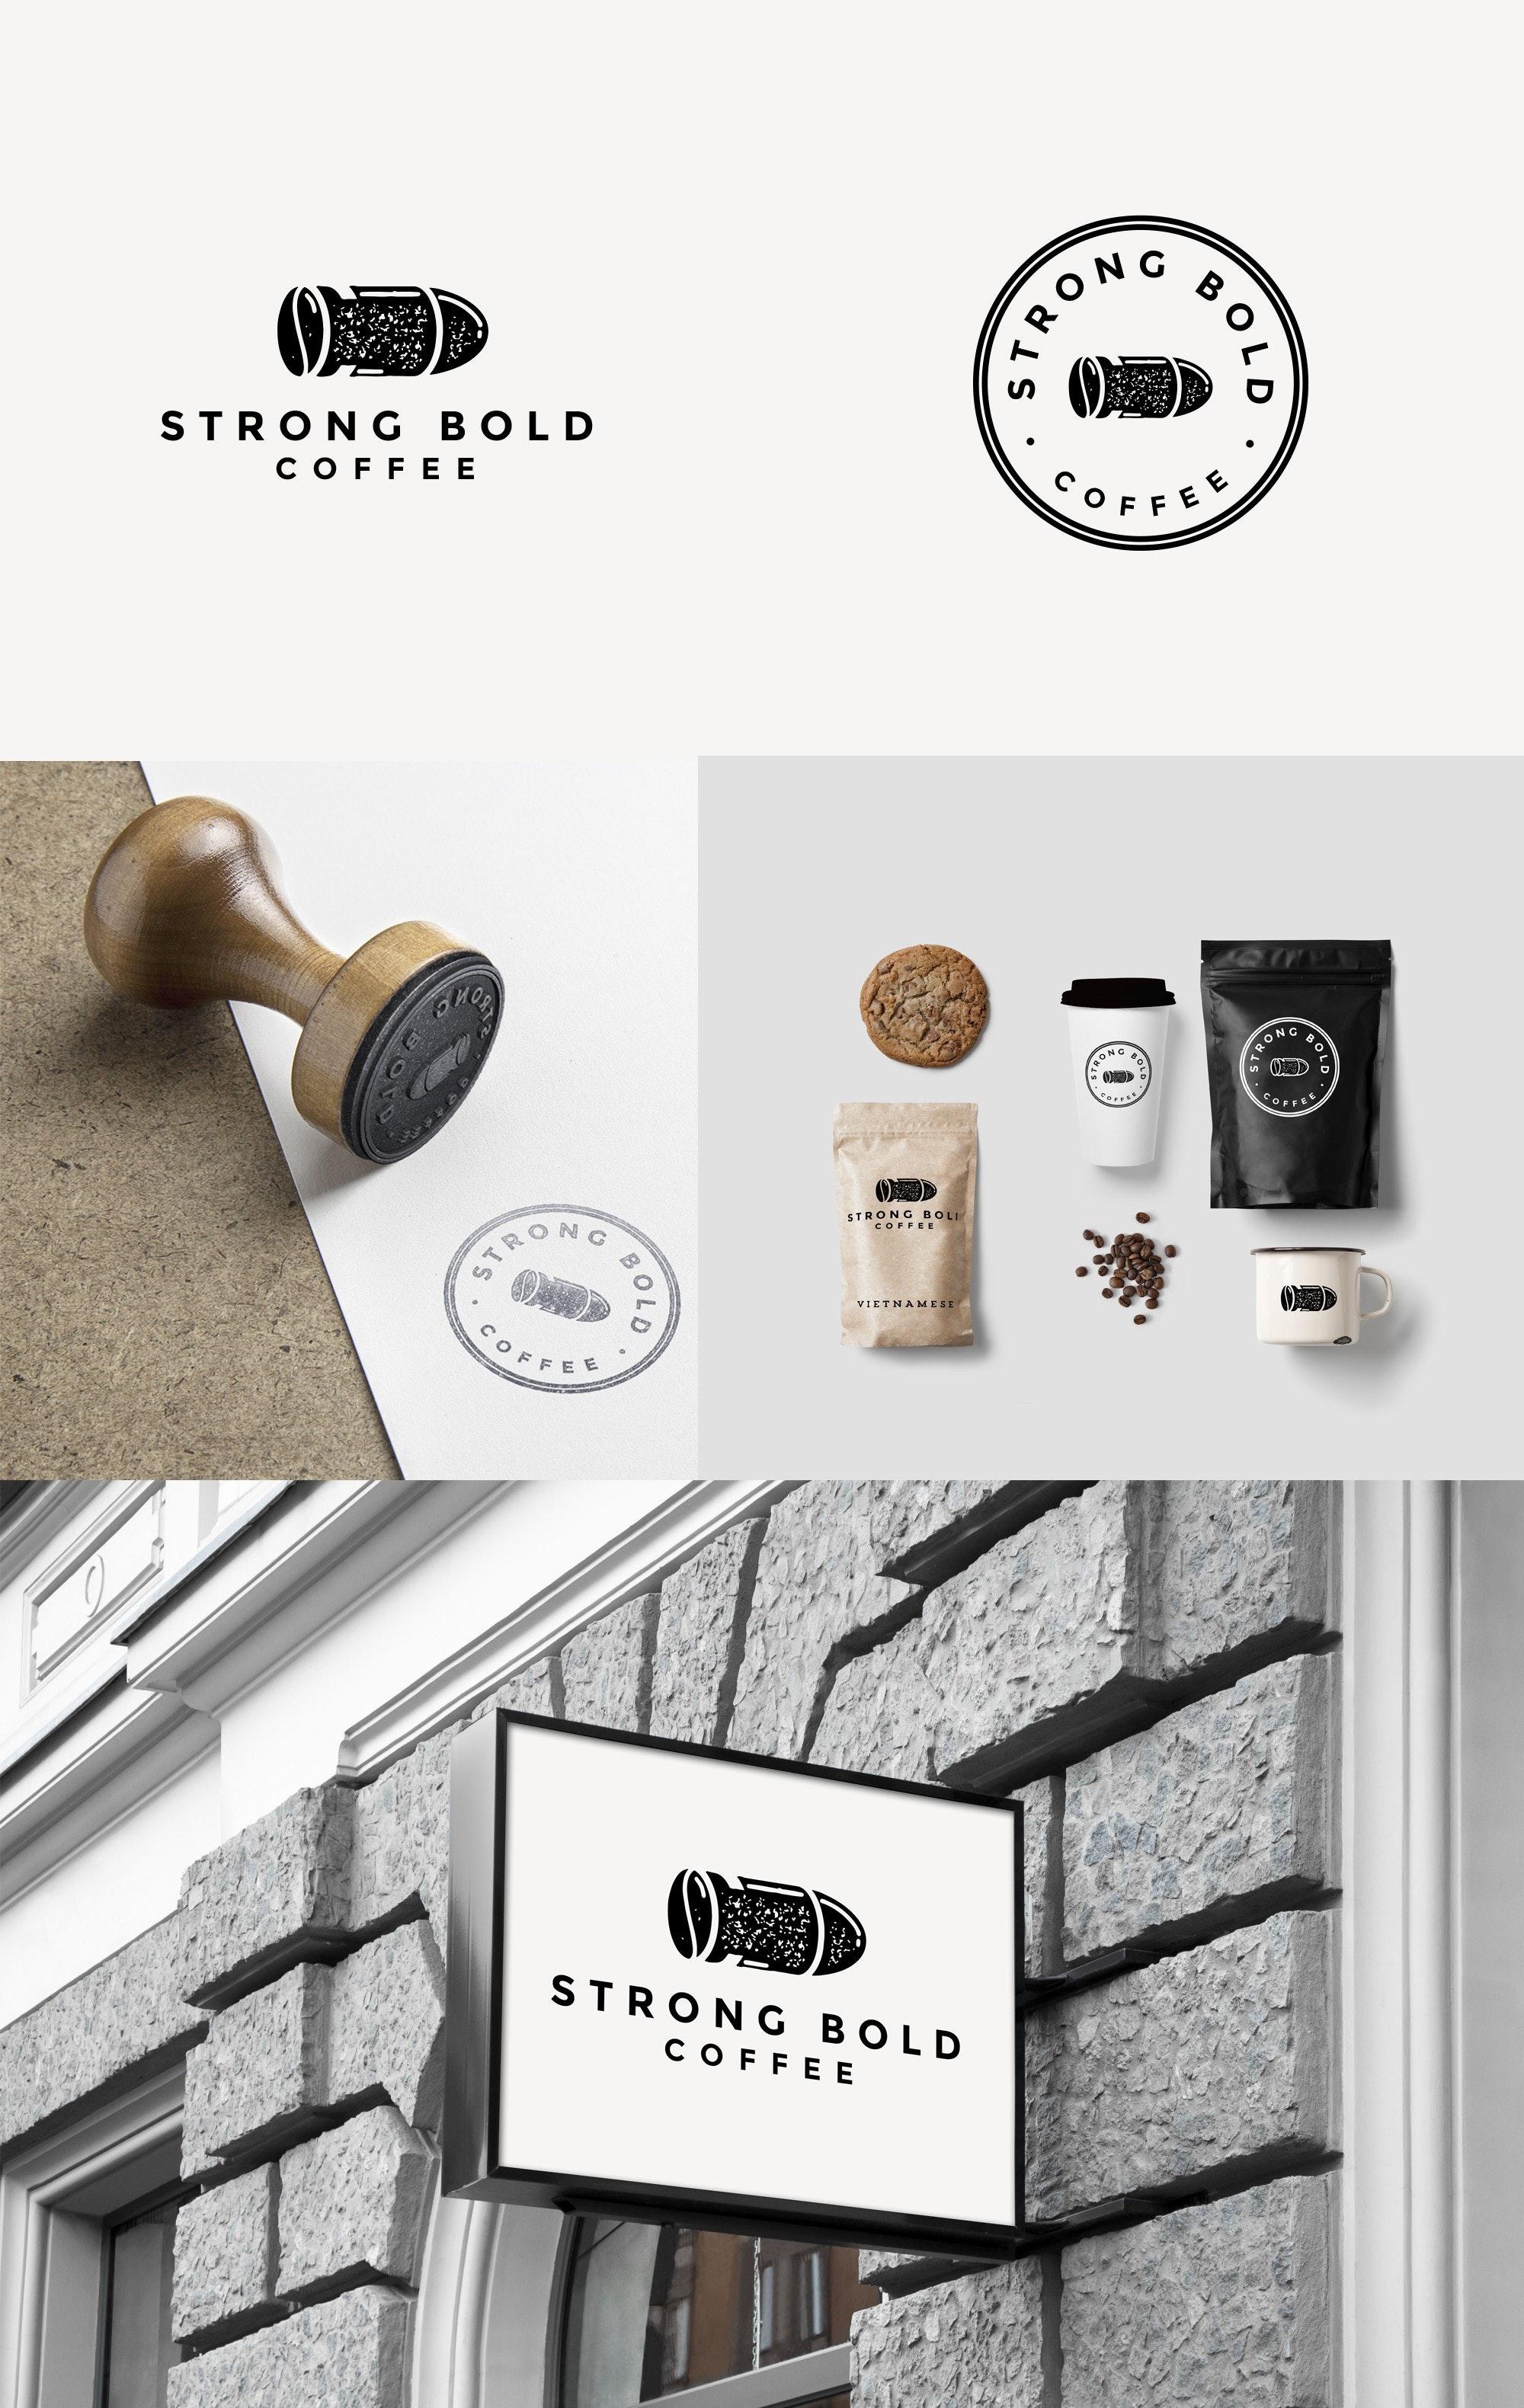 Strong Bold Coffee logo